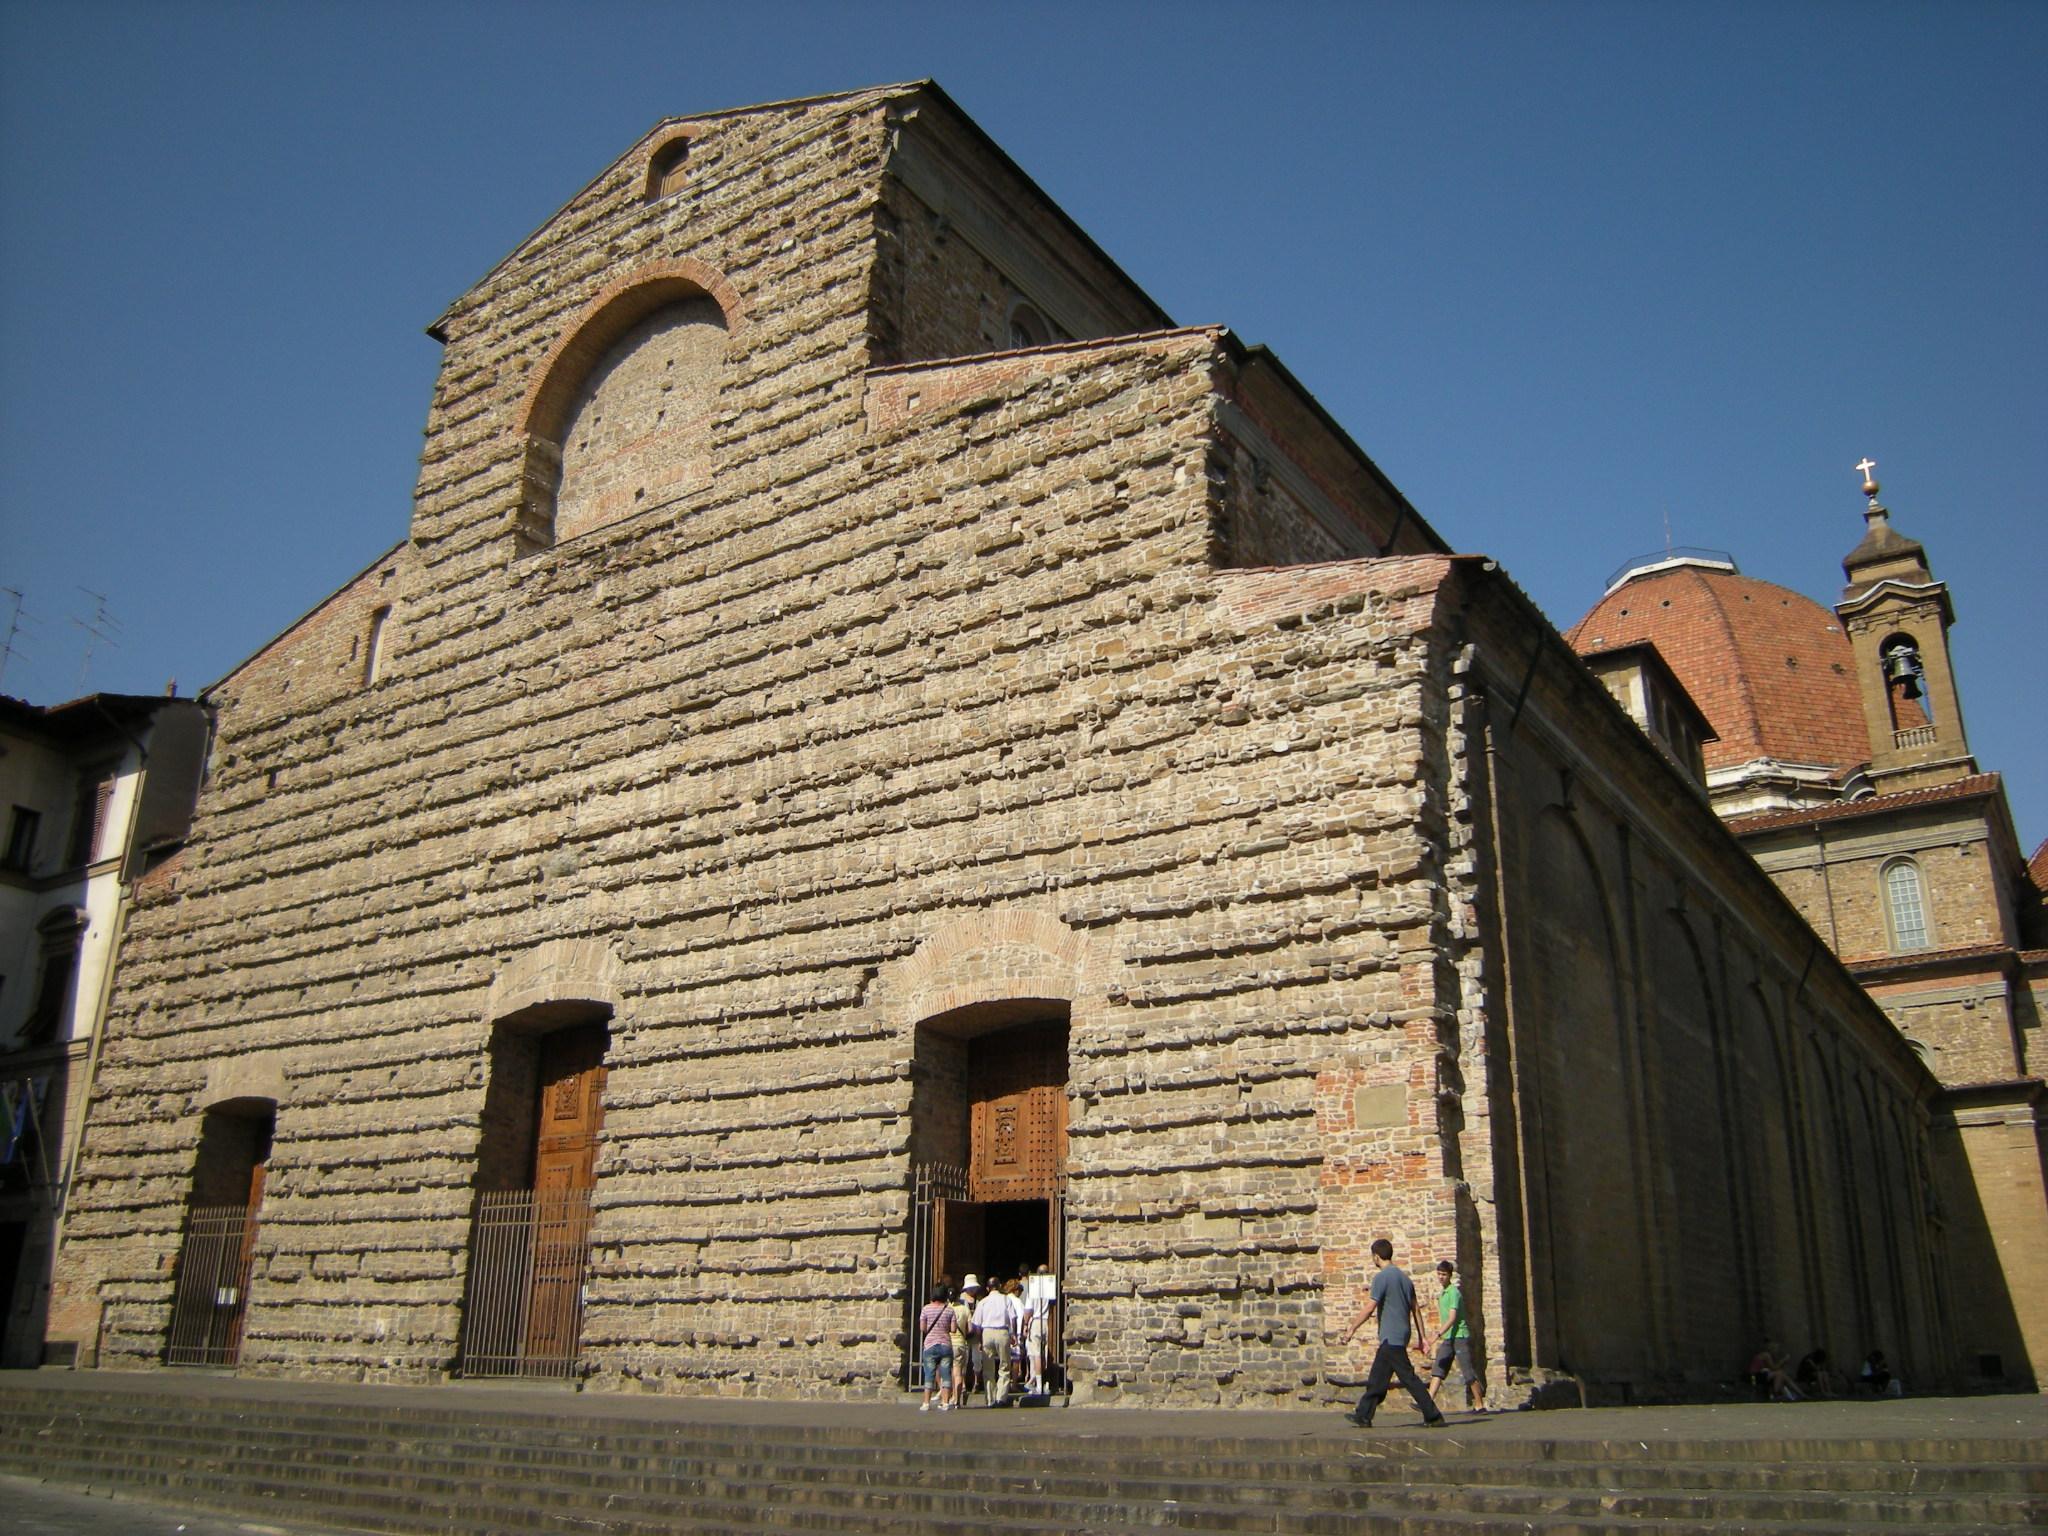 file:basilica di san lorenzo (3846332242) (3) - wikimedia commons